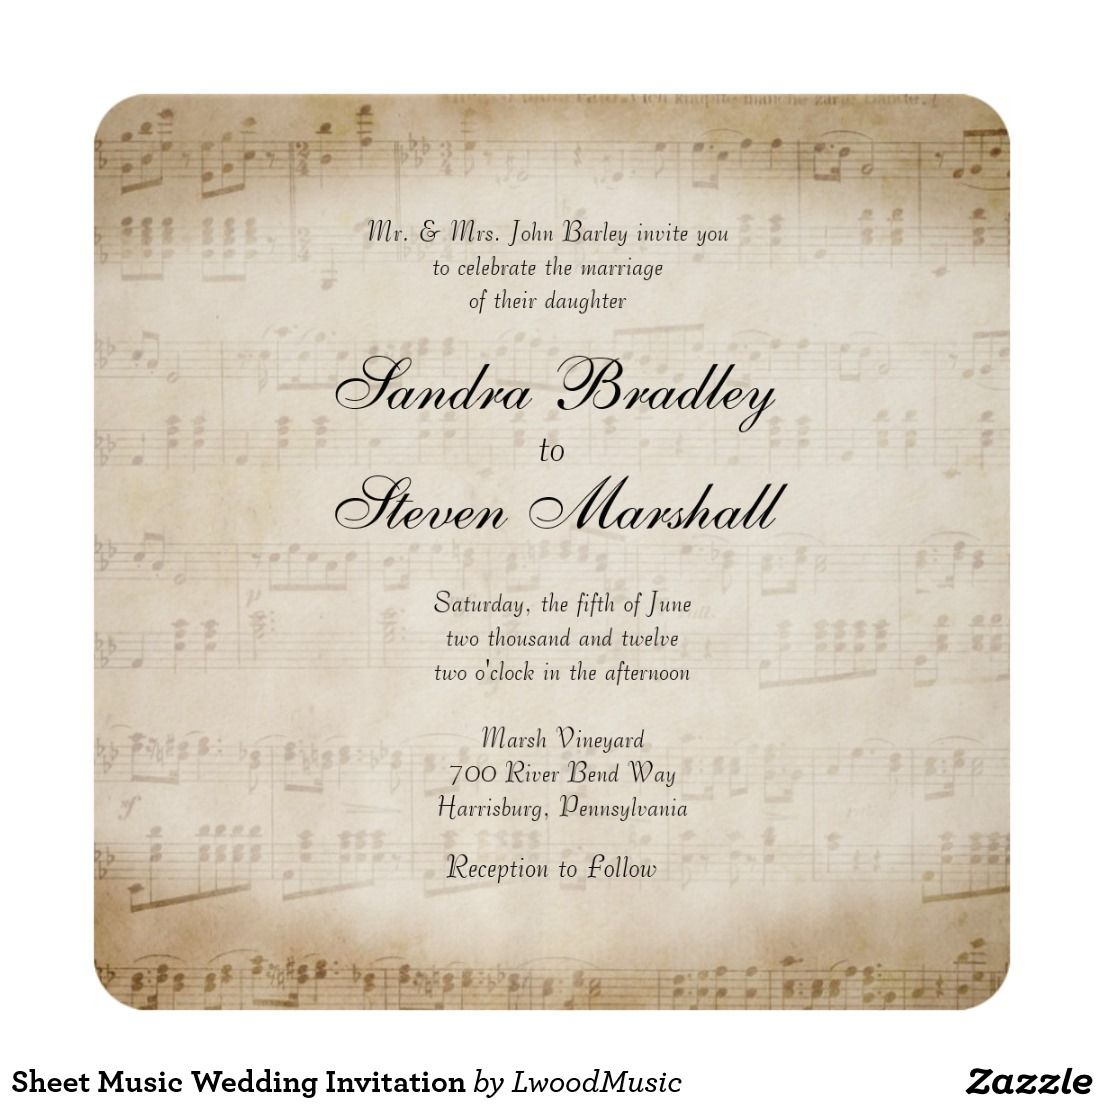 Sheet Music Wedding Invitation | Wedding | Pinterest | Music wedding ...